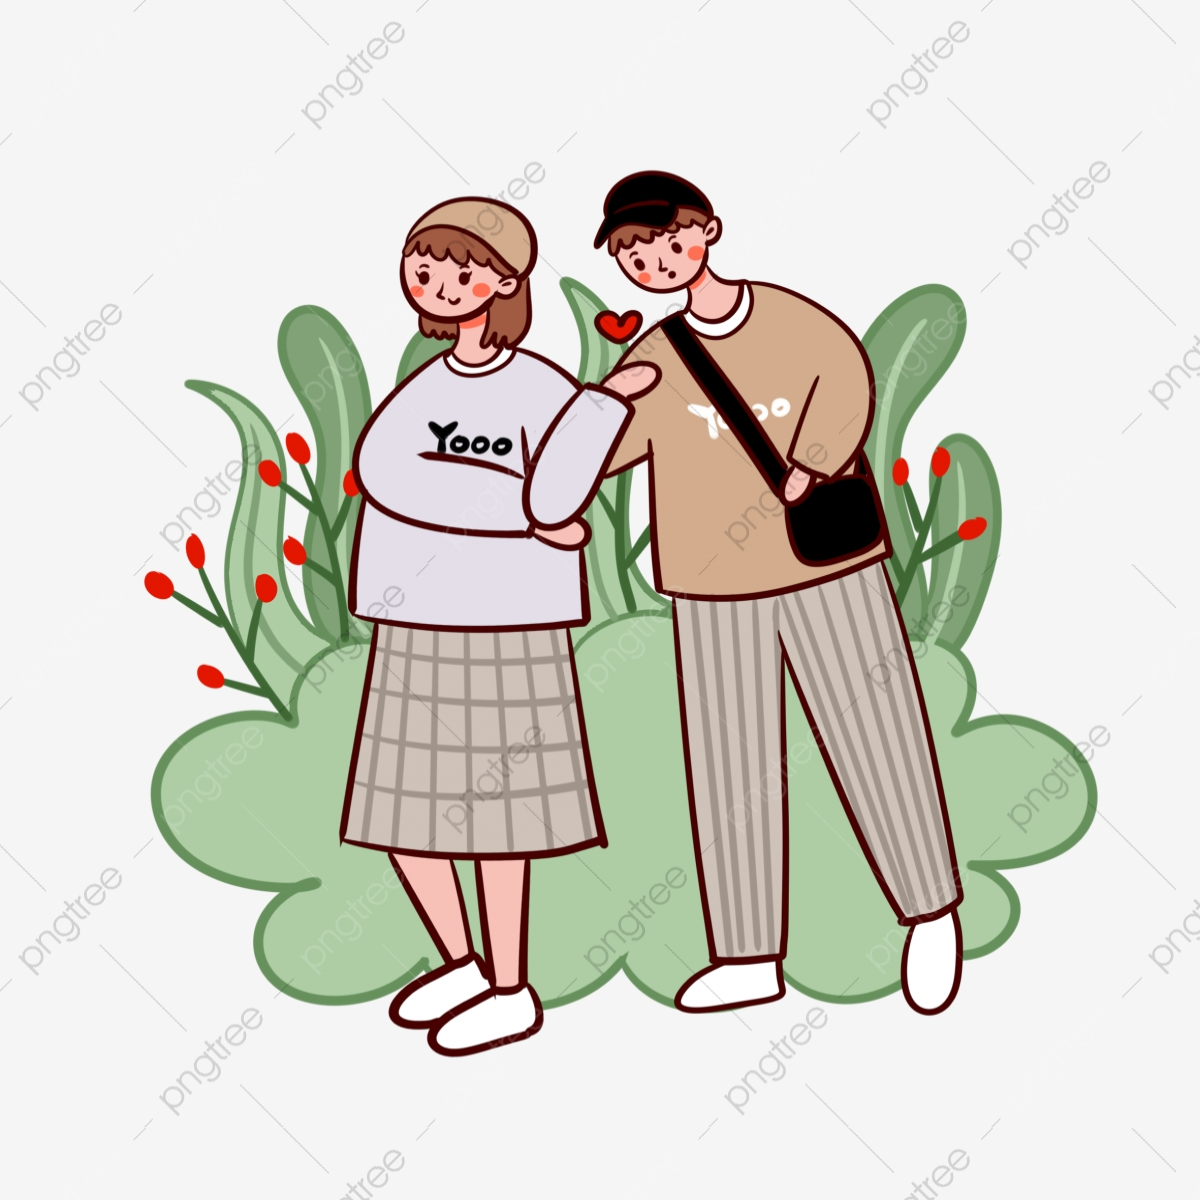 30+ Gambar Kartun Korea Pasangan Romantis - Gambar Kartun Mu